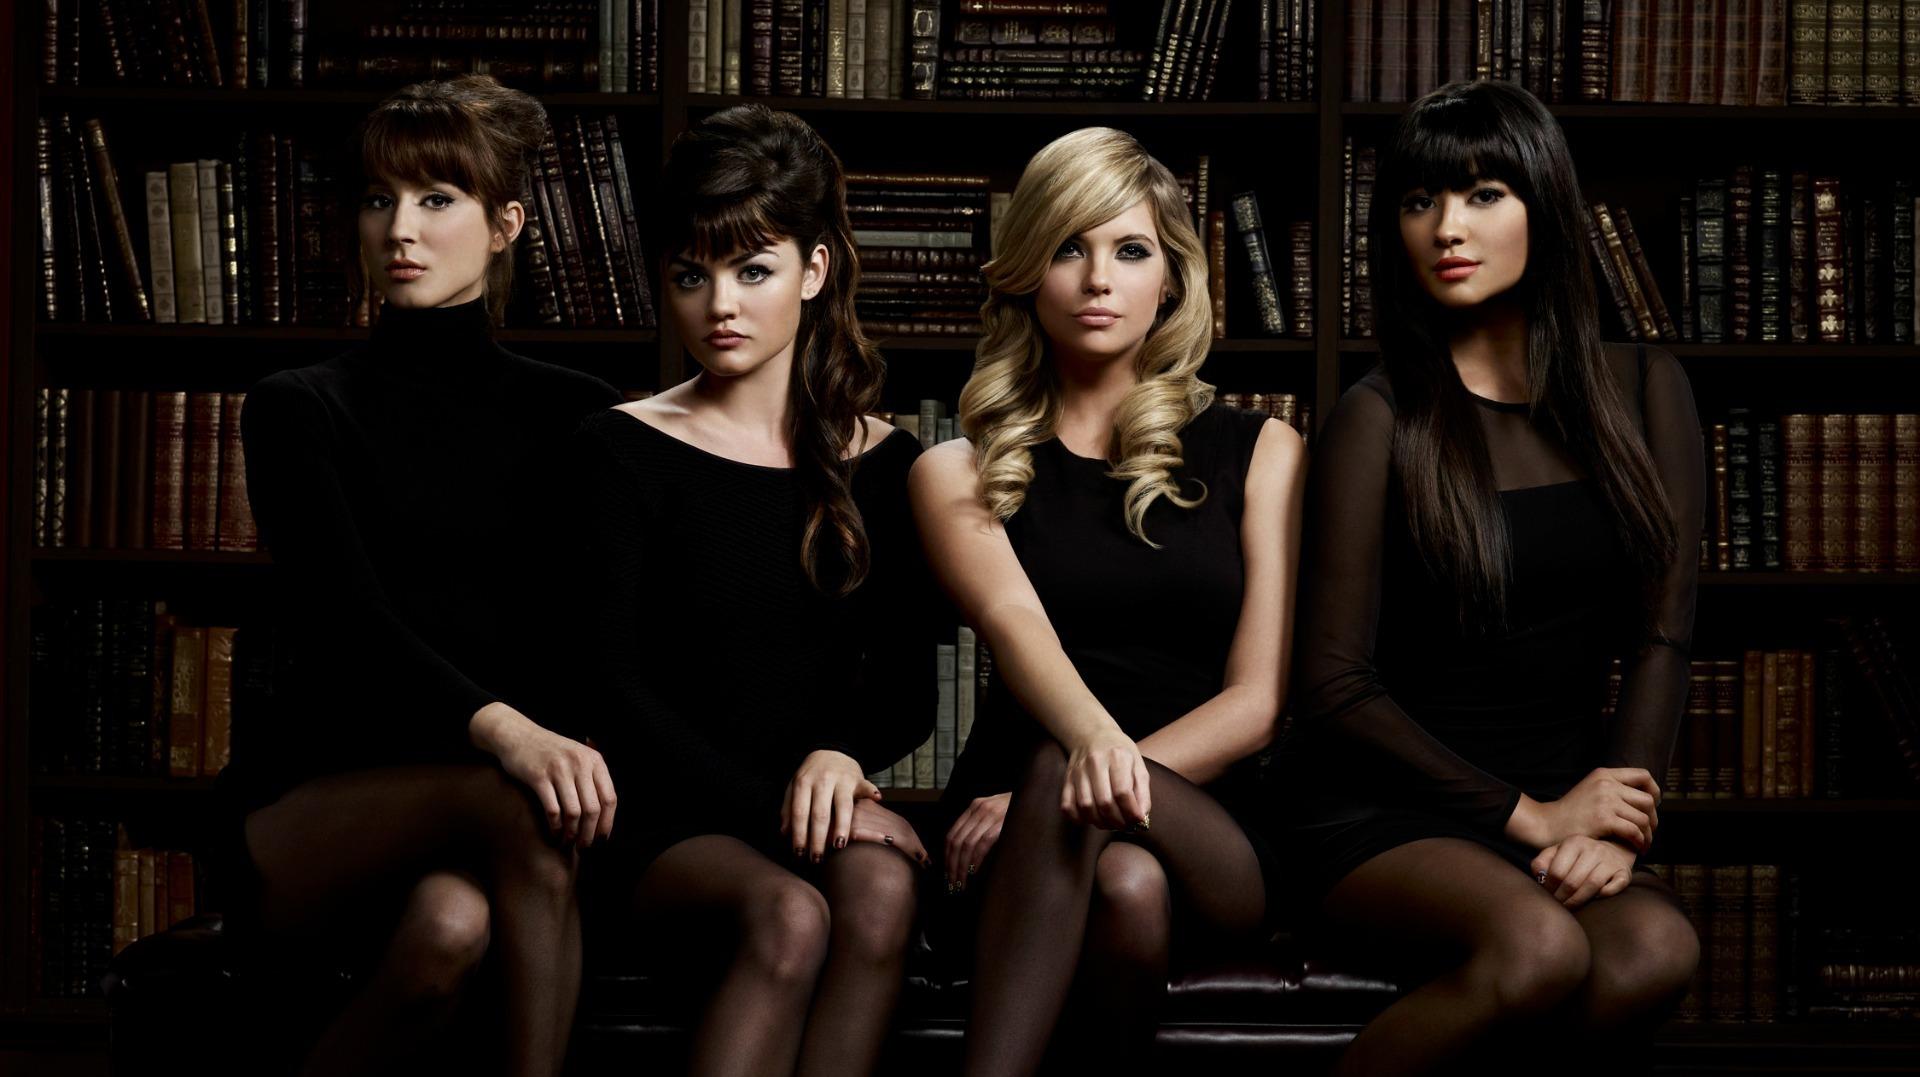 Pretty Little Liars: 32 Fun insider secrets about the show you haven't  heard – SheKnows